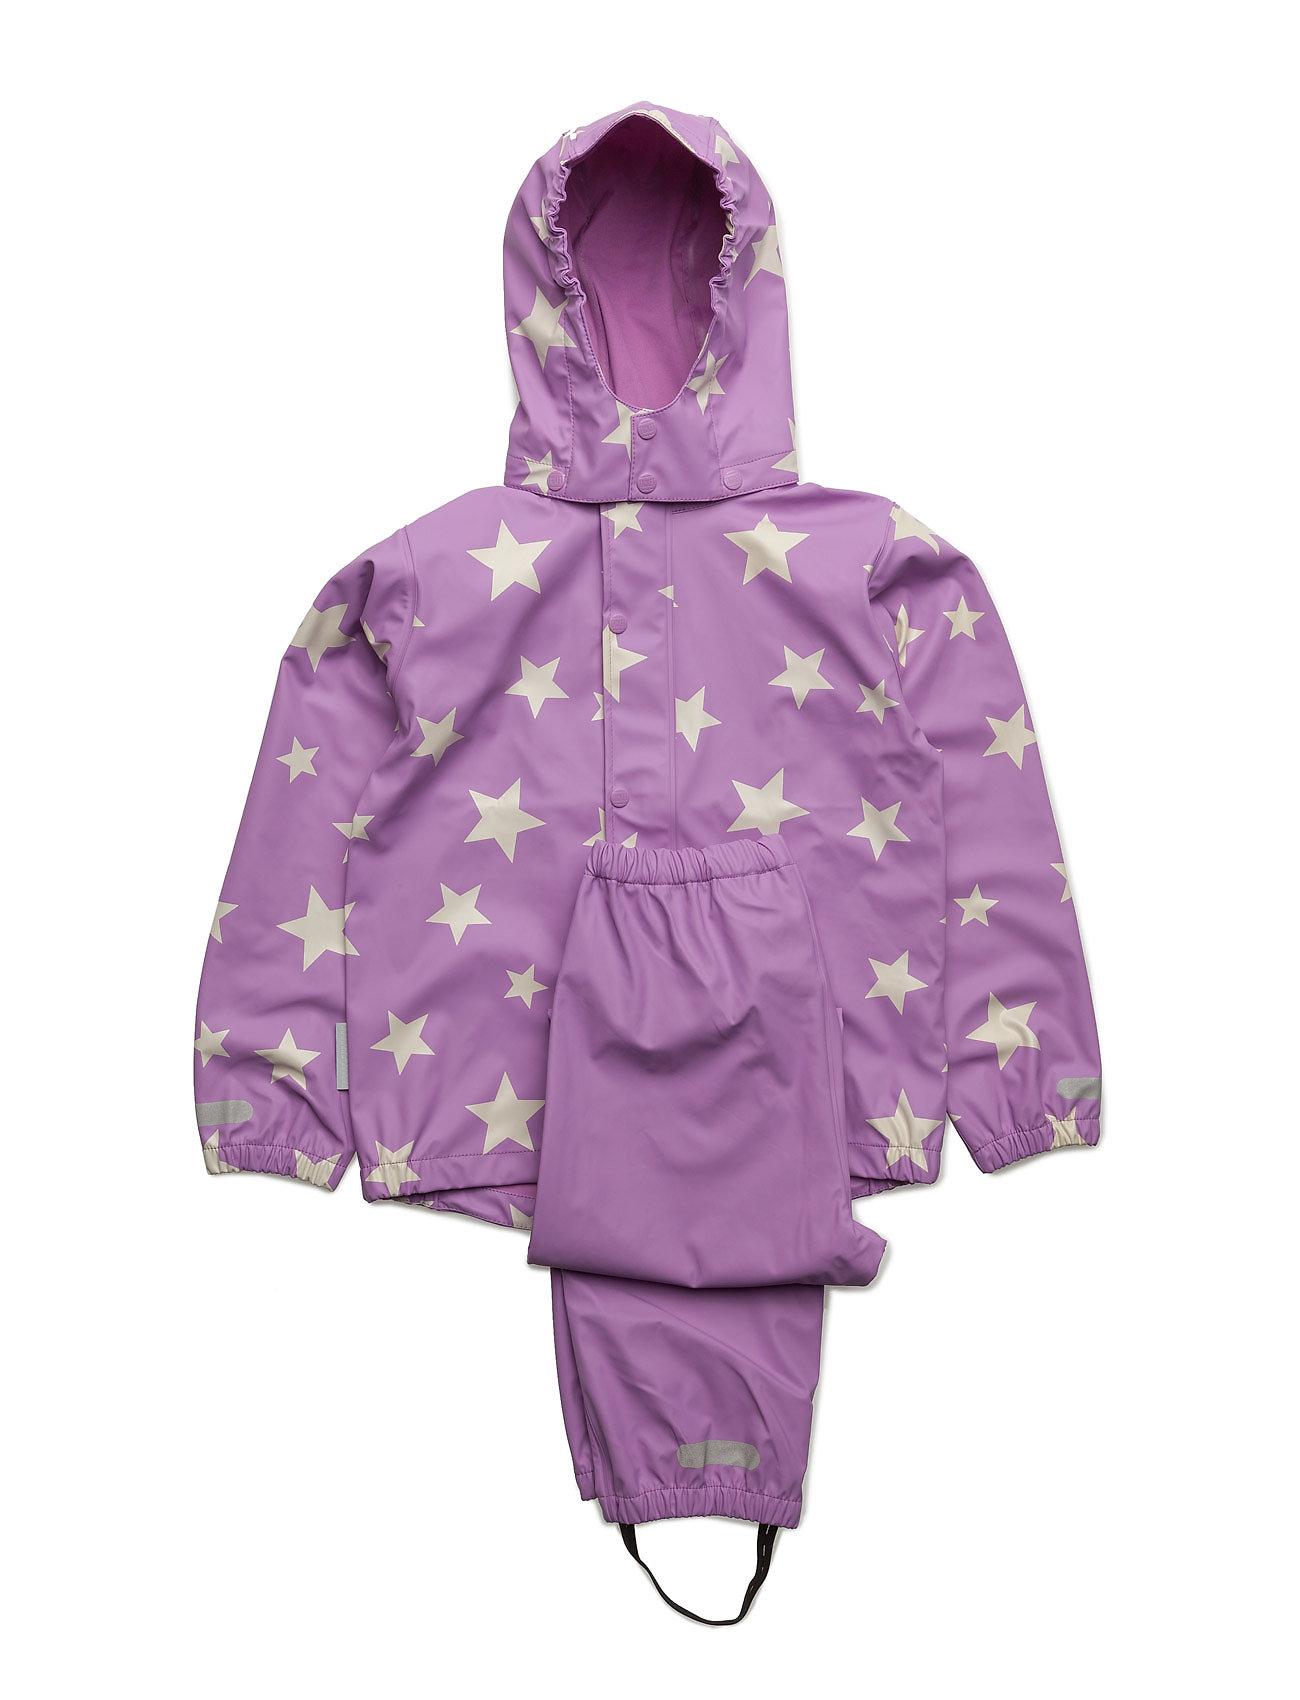 Rain Set 2pcs Rubber With Detachable Hood Allover Ticket to Heaven Regntøj til Børn i